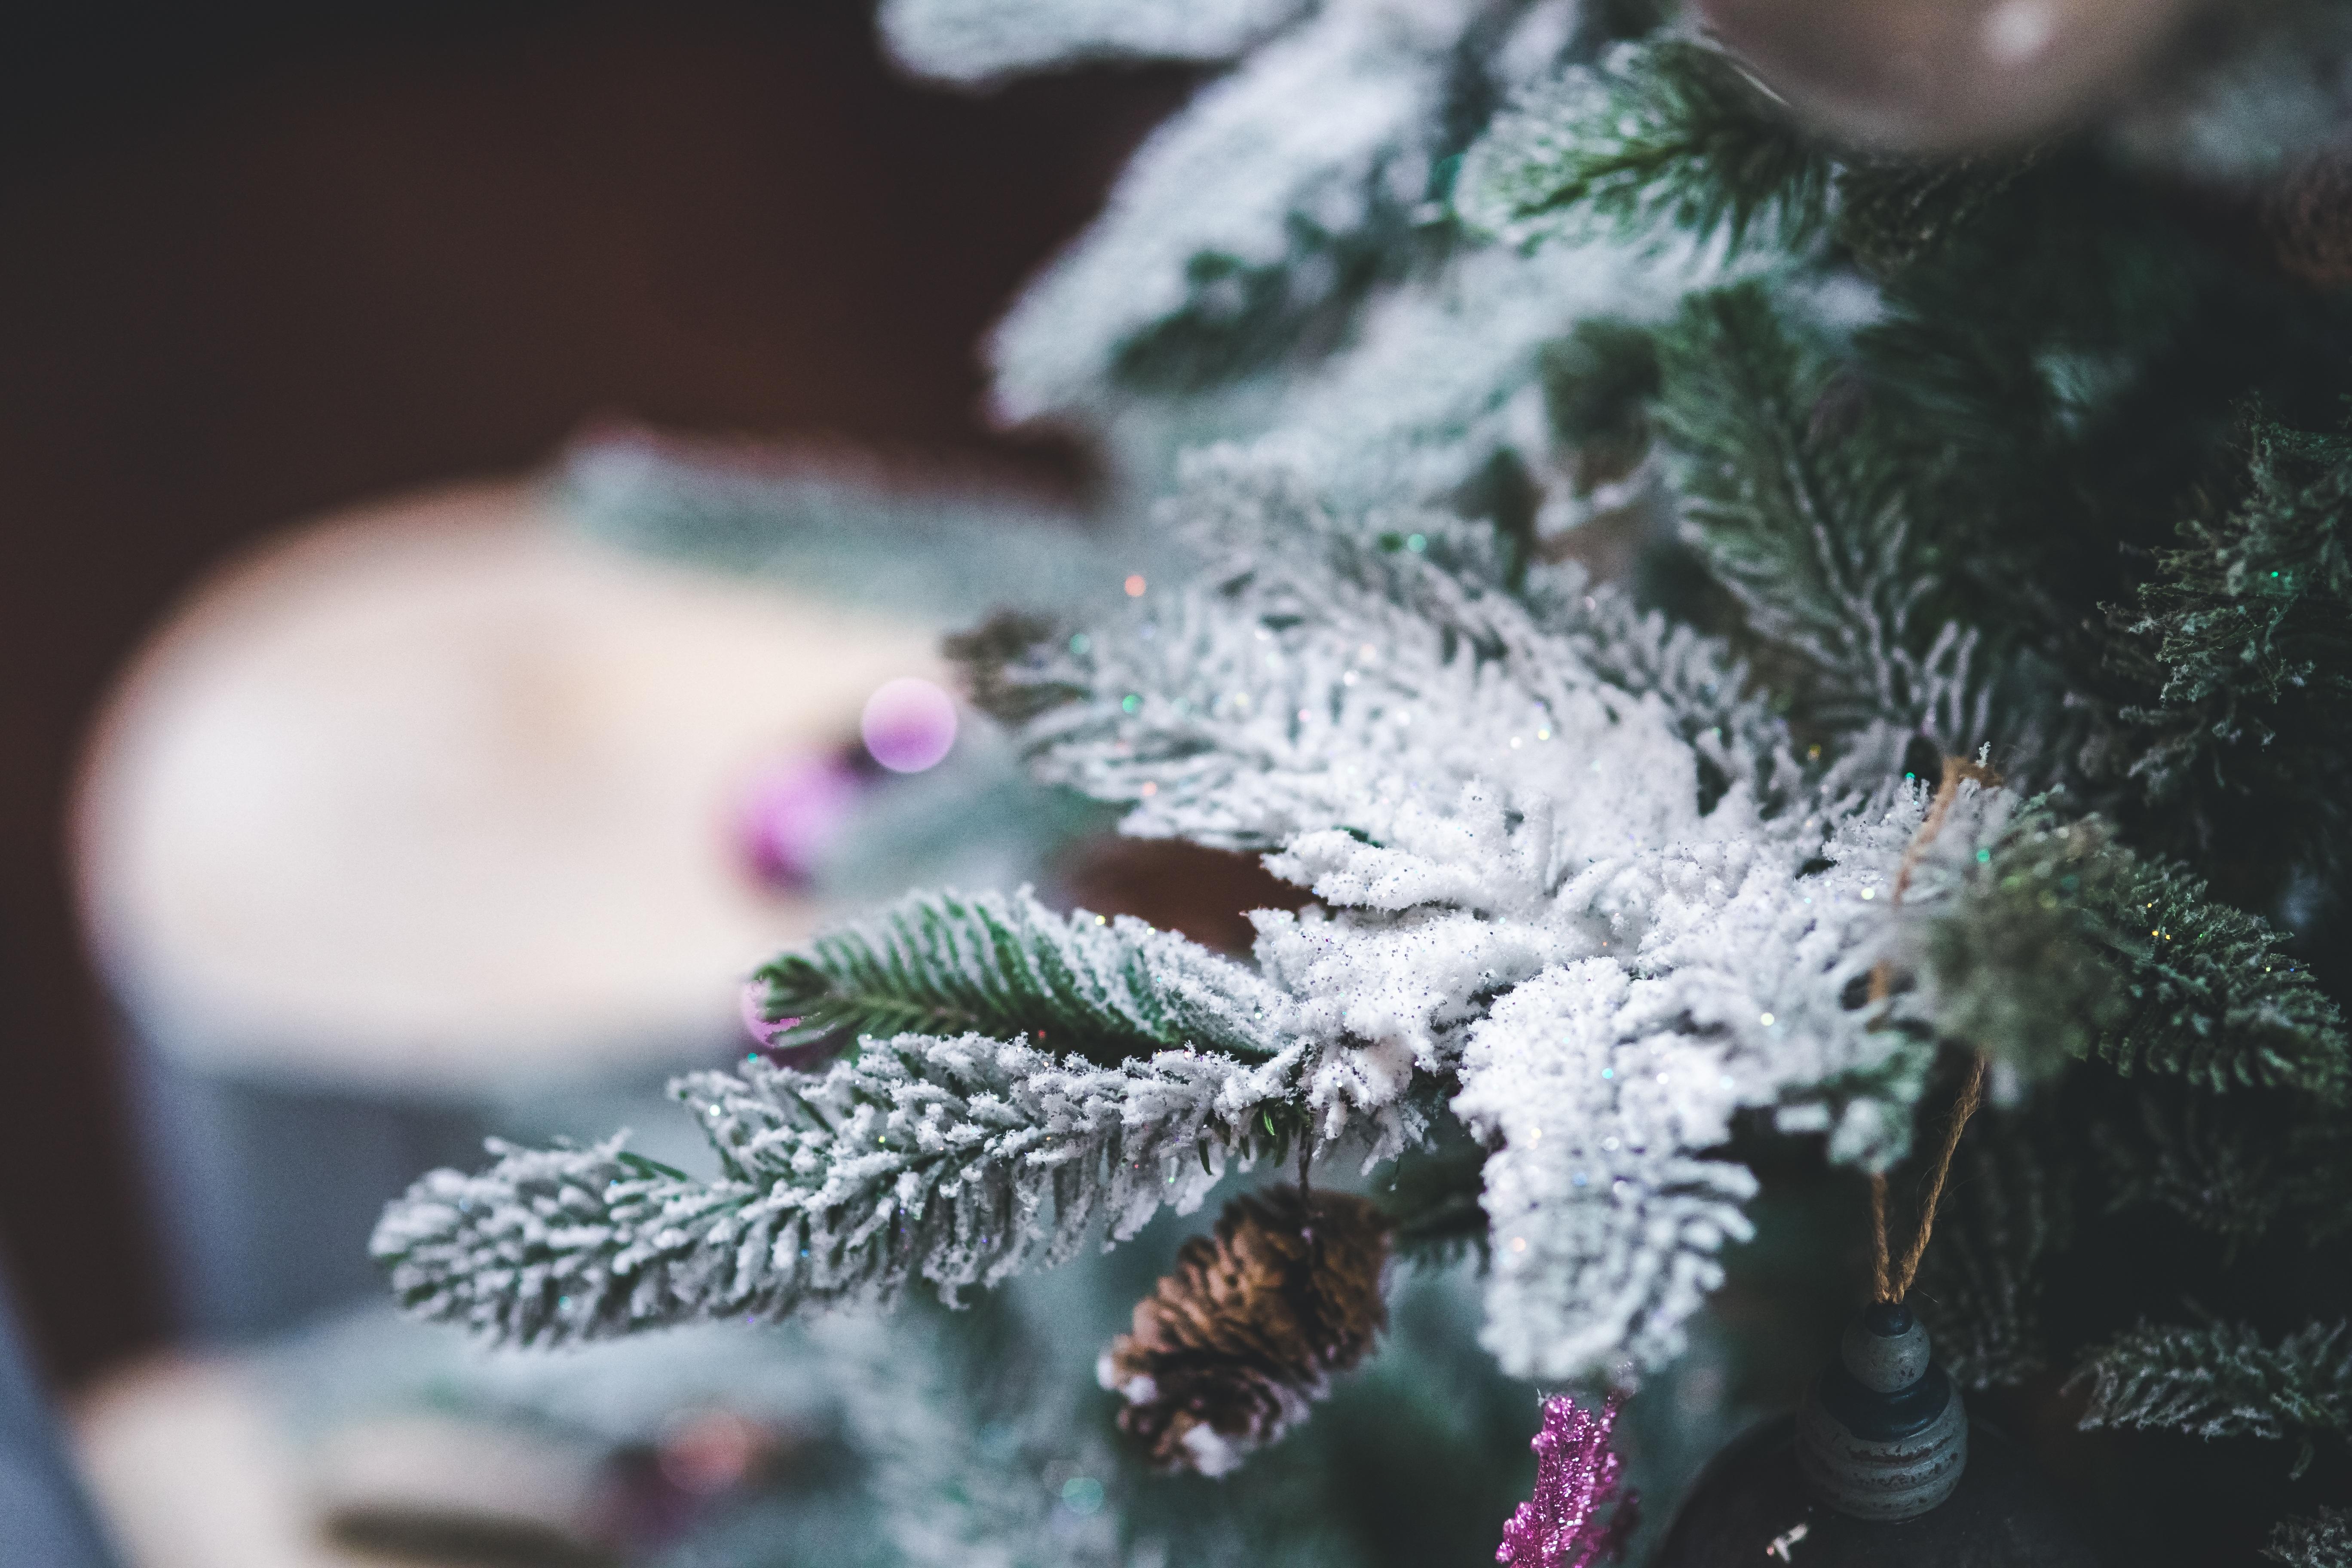 Wallpaper Of Christmas Tree